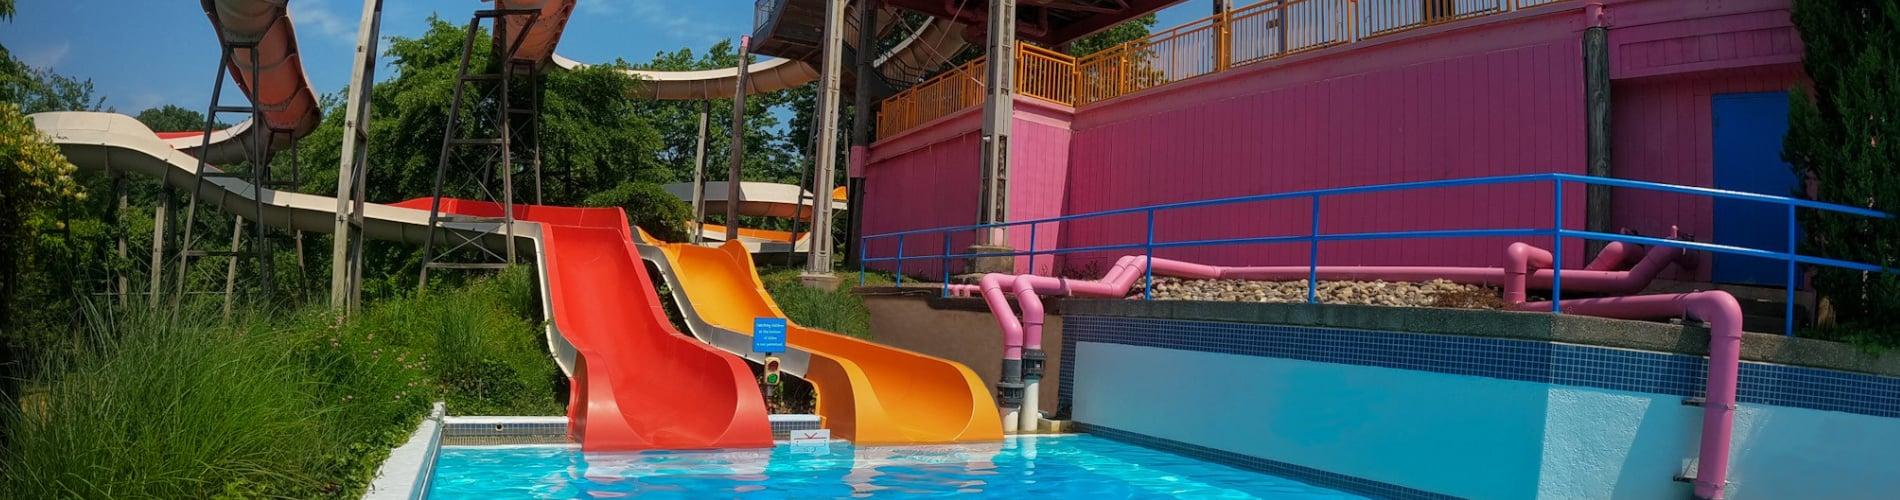 Elmos Slide